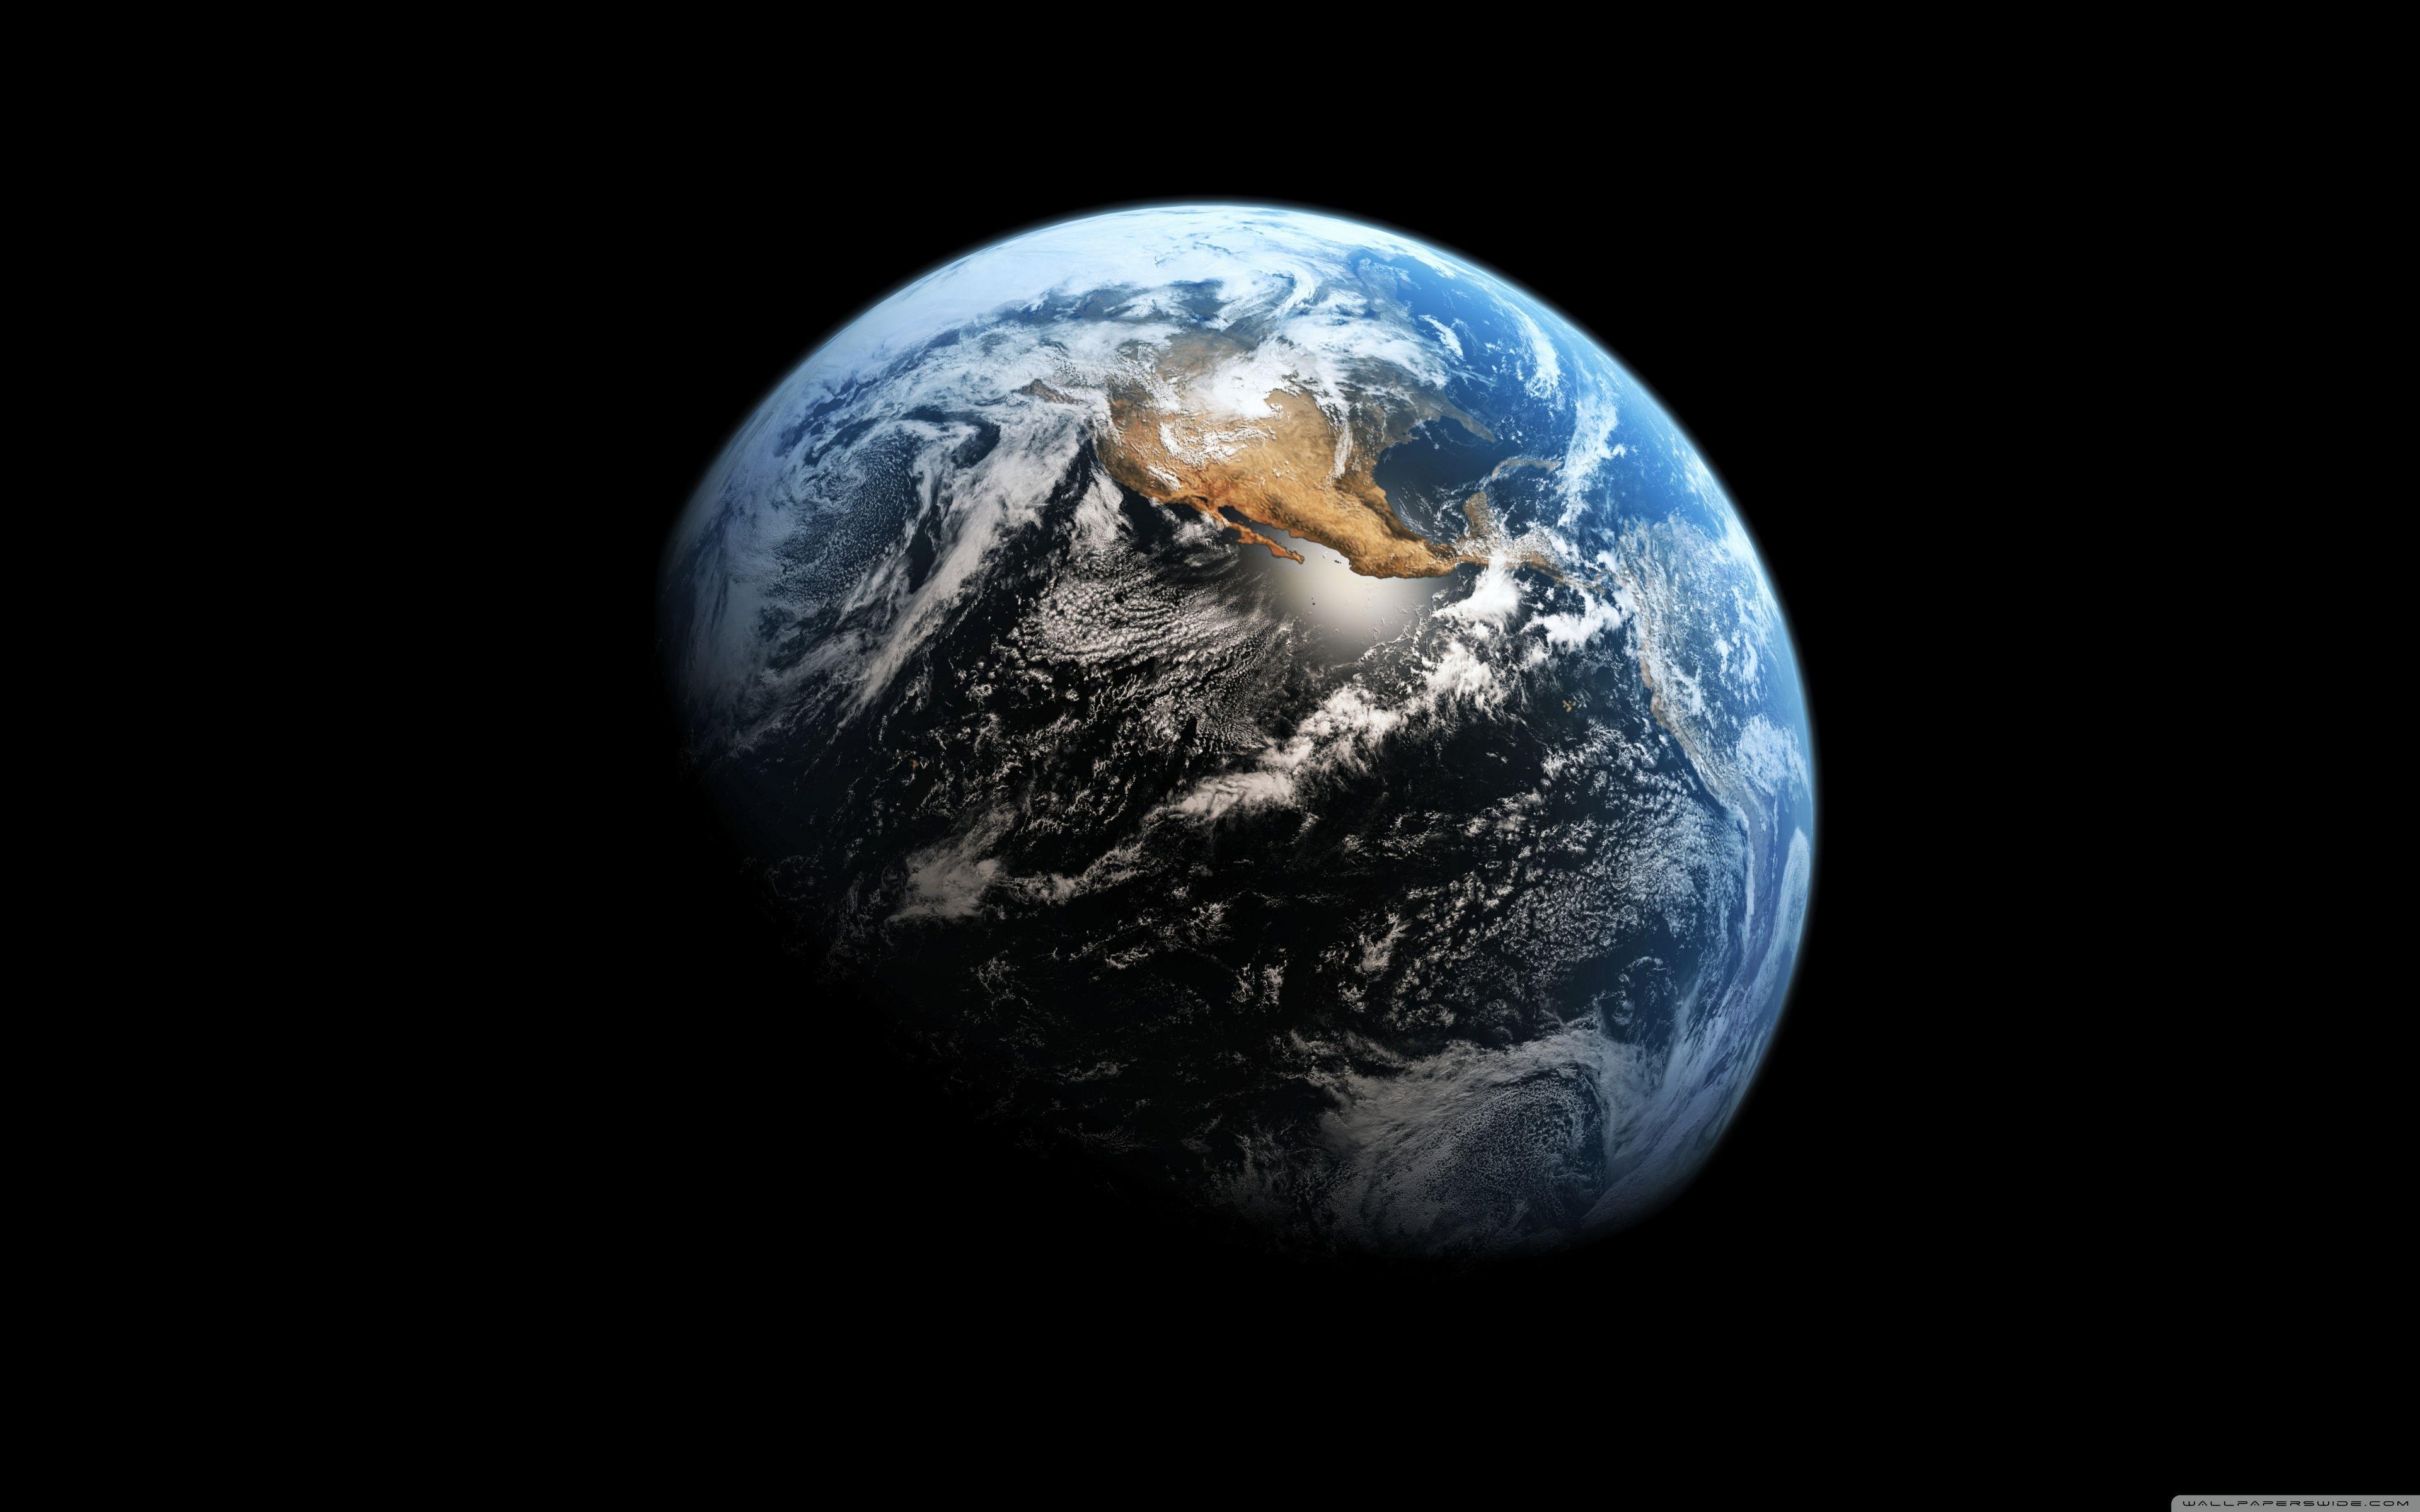 4k Earth Wallpapers Top Free 4k Earth Backgrounds Wallpaperaccess In 2020 Wallpaper Earth Iphone Wallpaper Earth Earth Hd